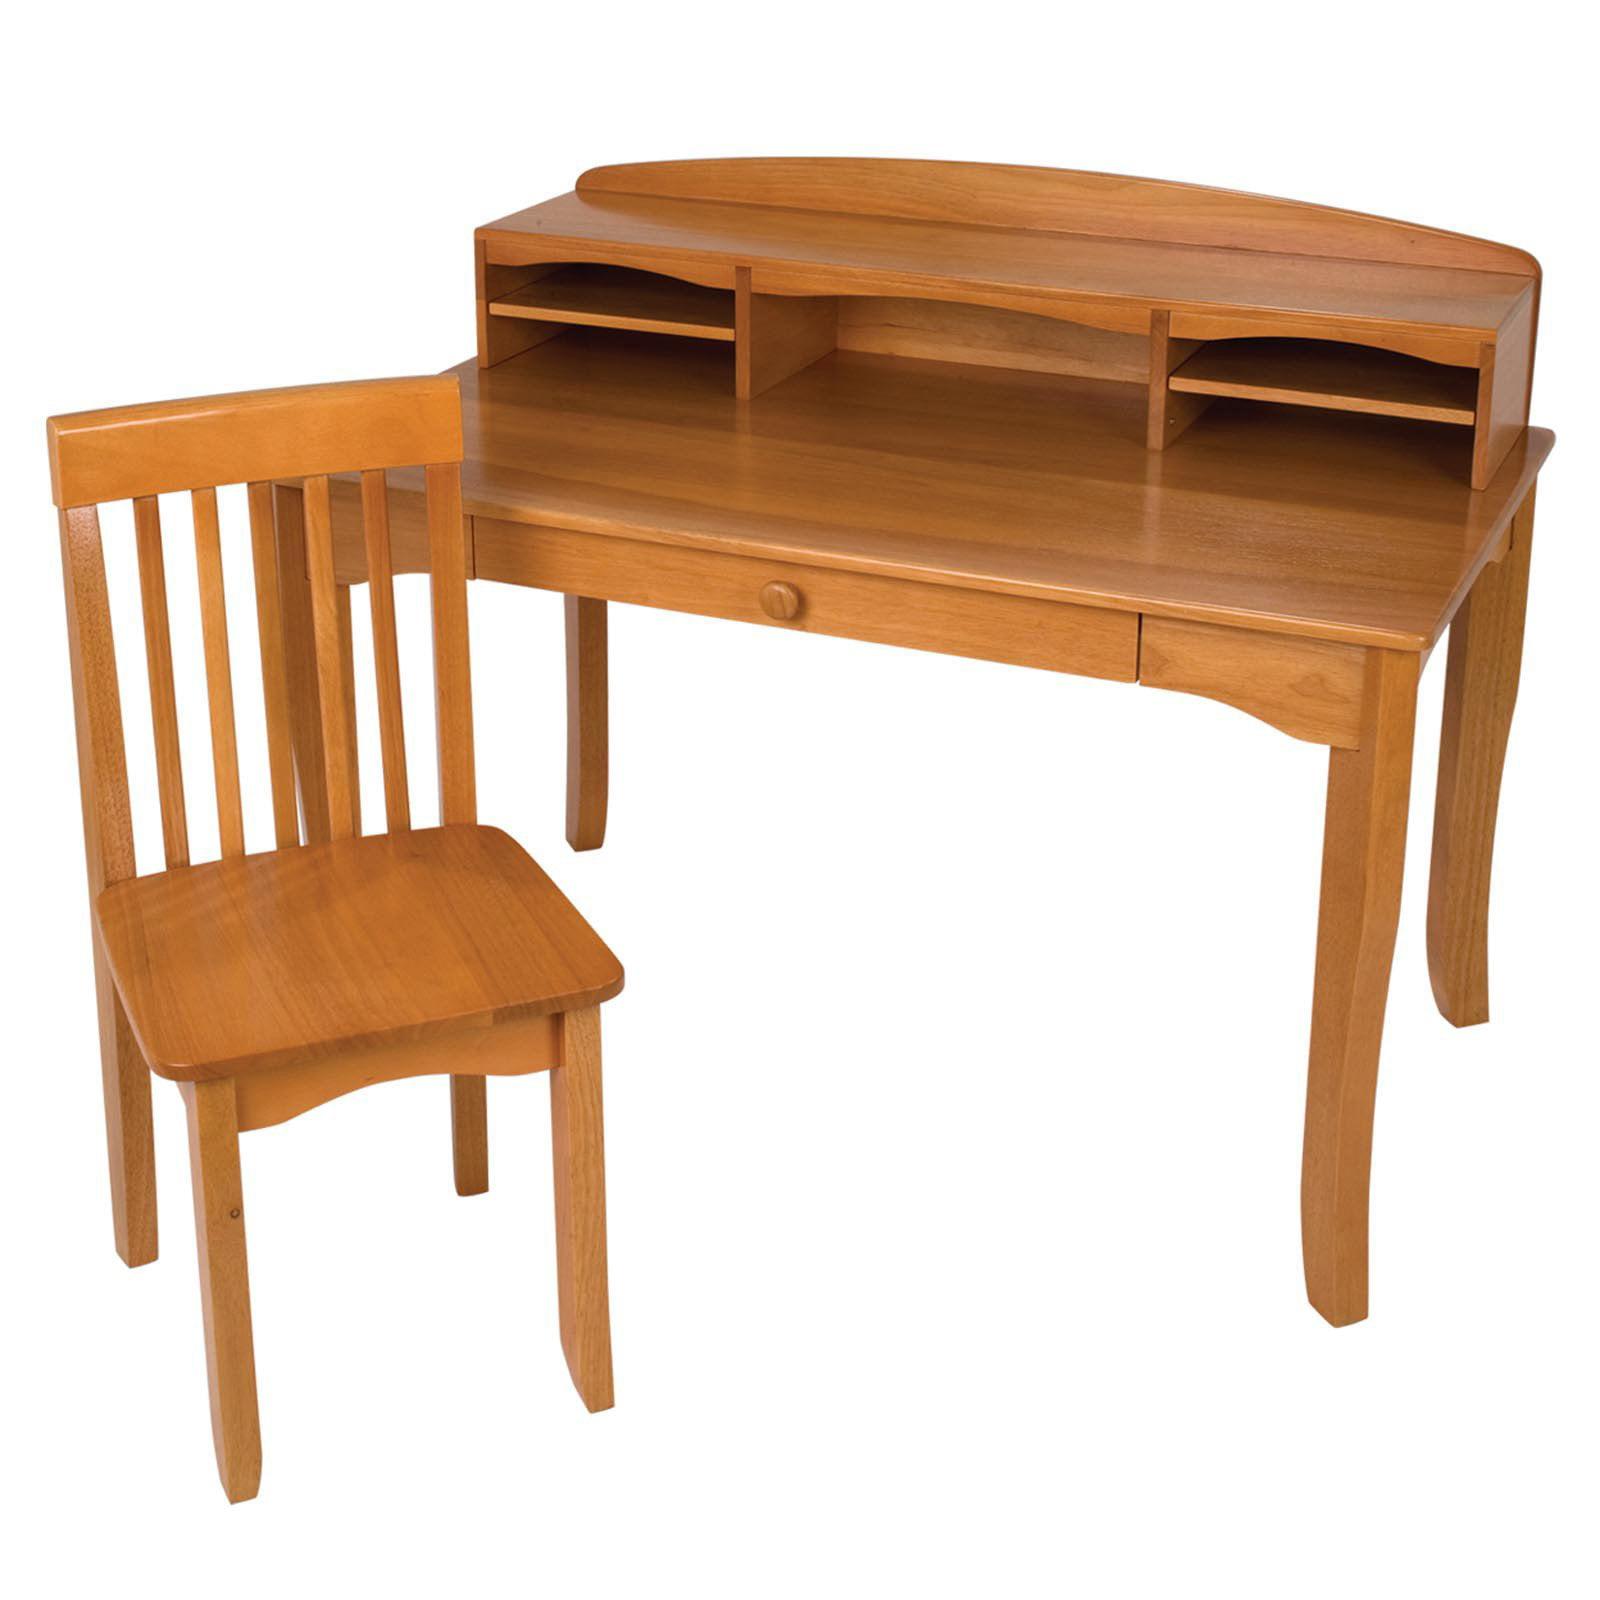 KidKraft Avalon Desk With Hutch   Walmart.com